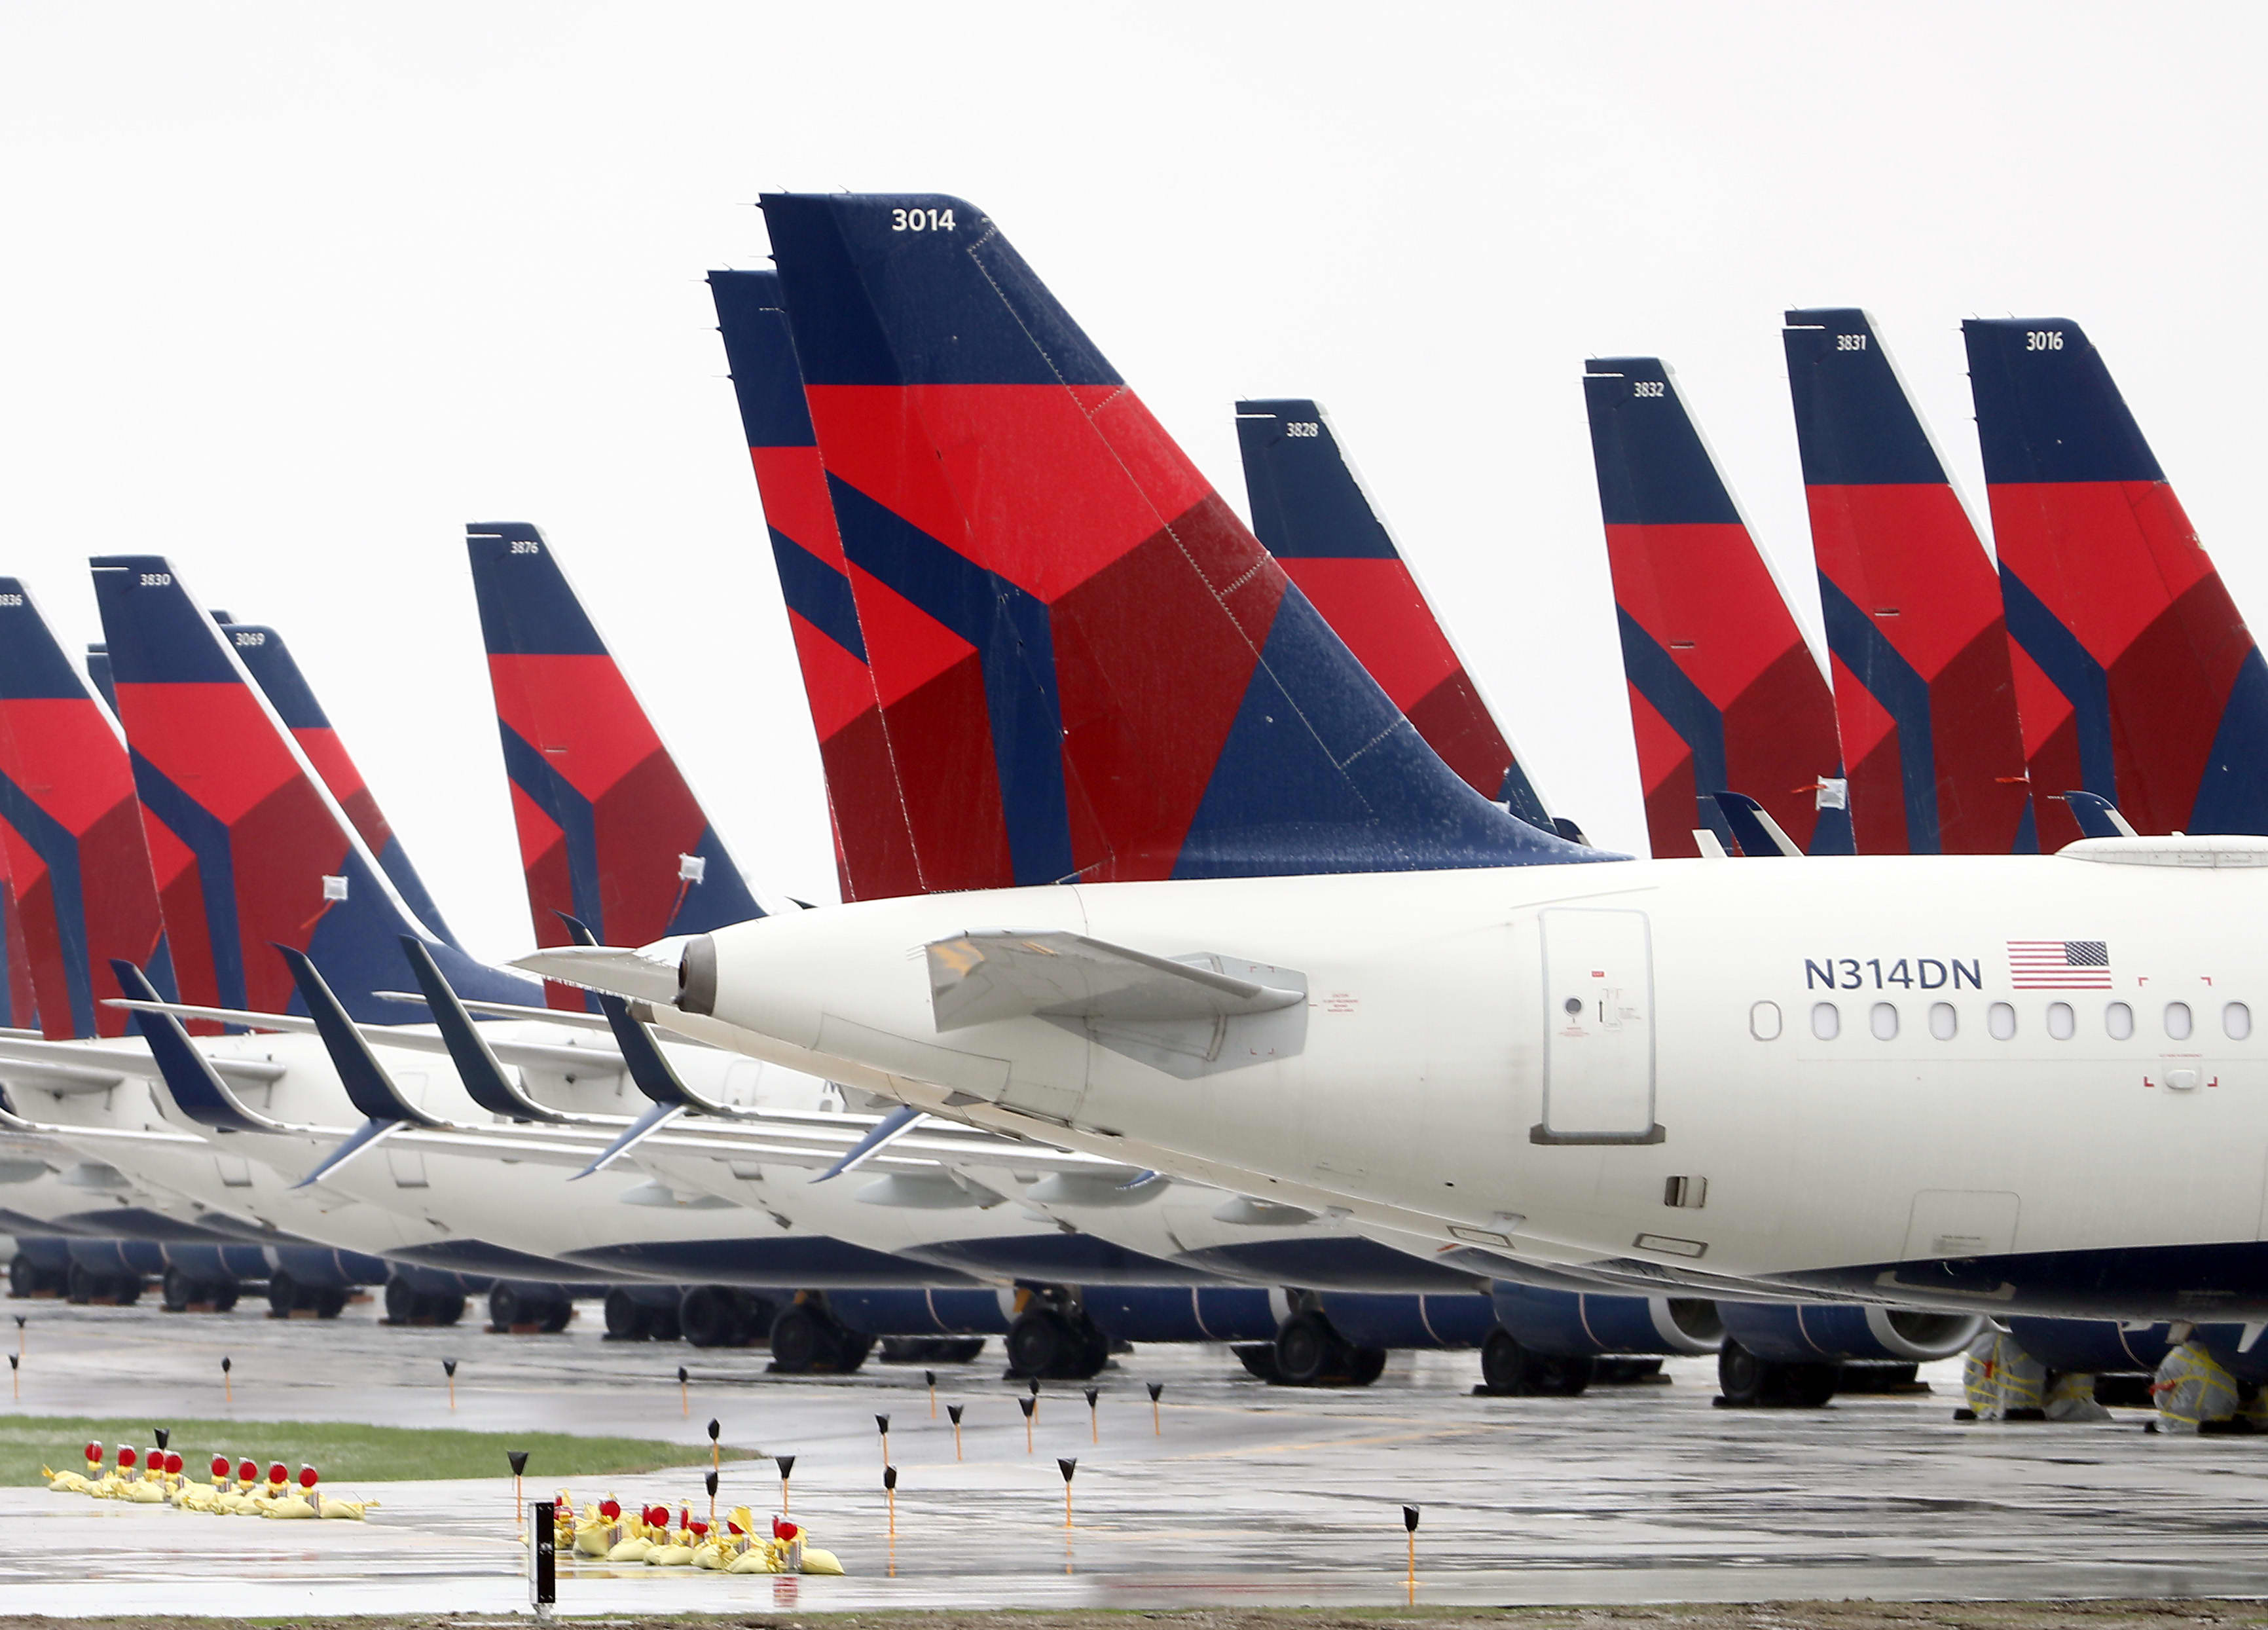 Delta (DAL) posts 1Q20 loss of $607 million as coronavirus hurts travel demand